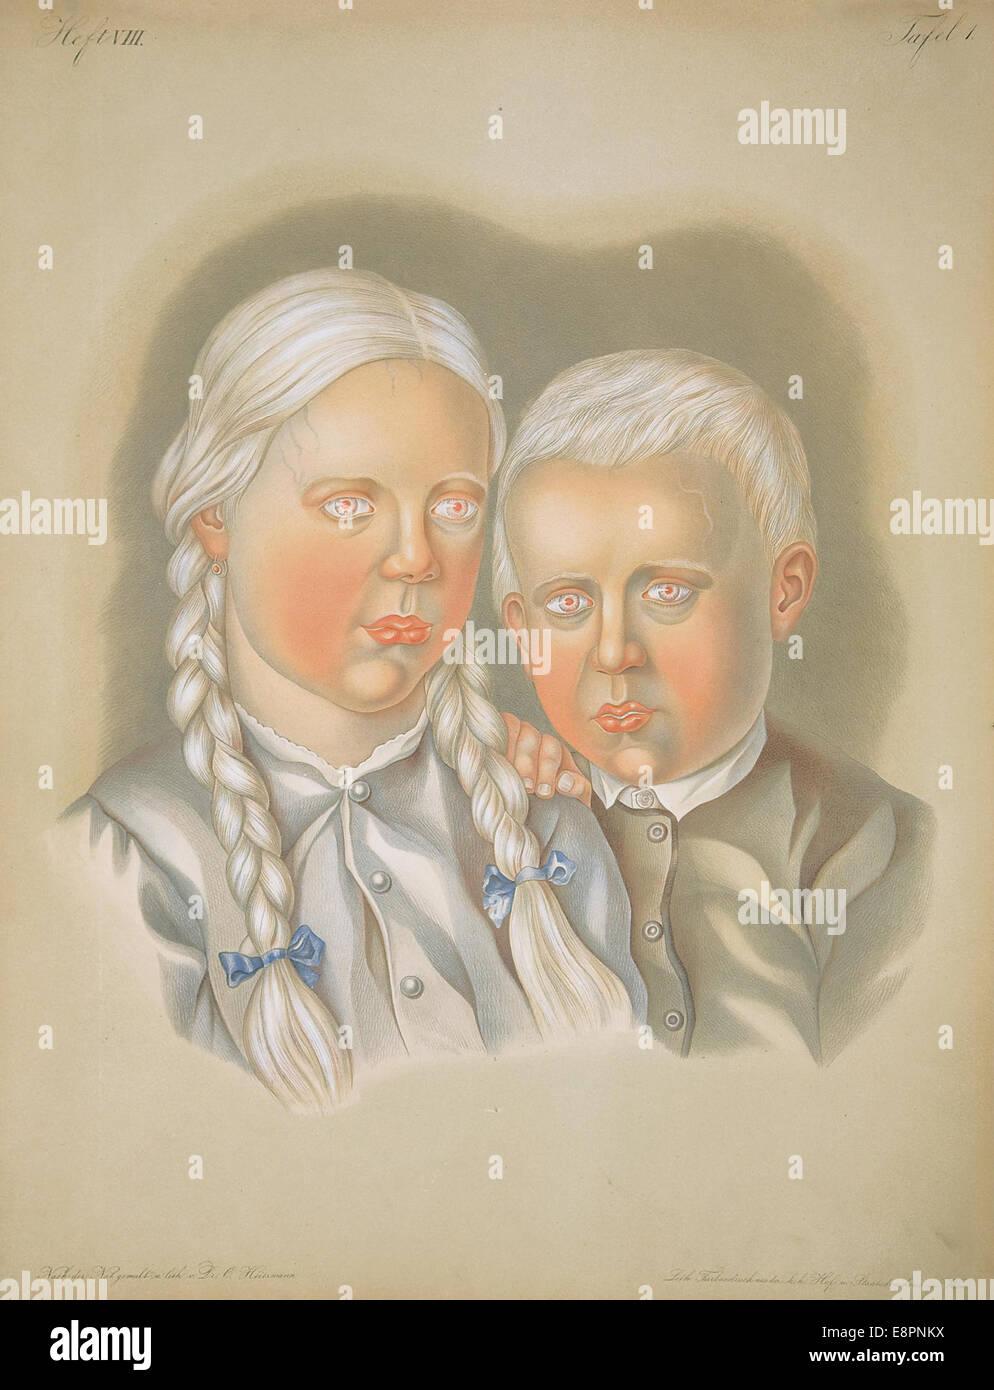 Appears In: Hebra, Ferdinand, Ritter von, 1816-1880. Atlas der Hautkrankheiten Image Description: Image of a lithograph Stock Photo